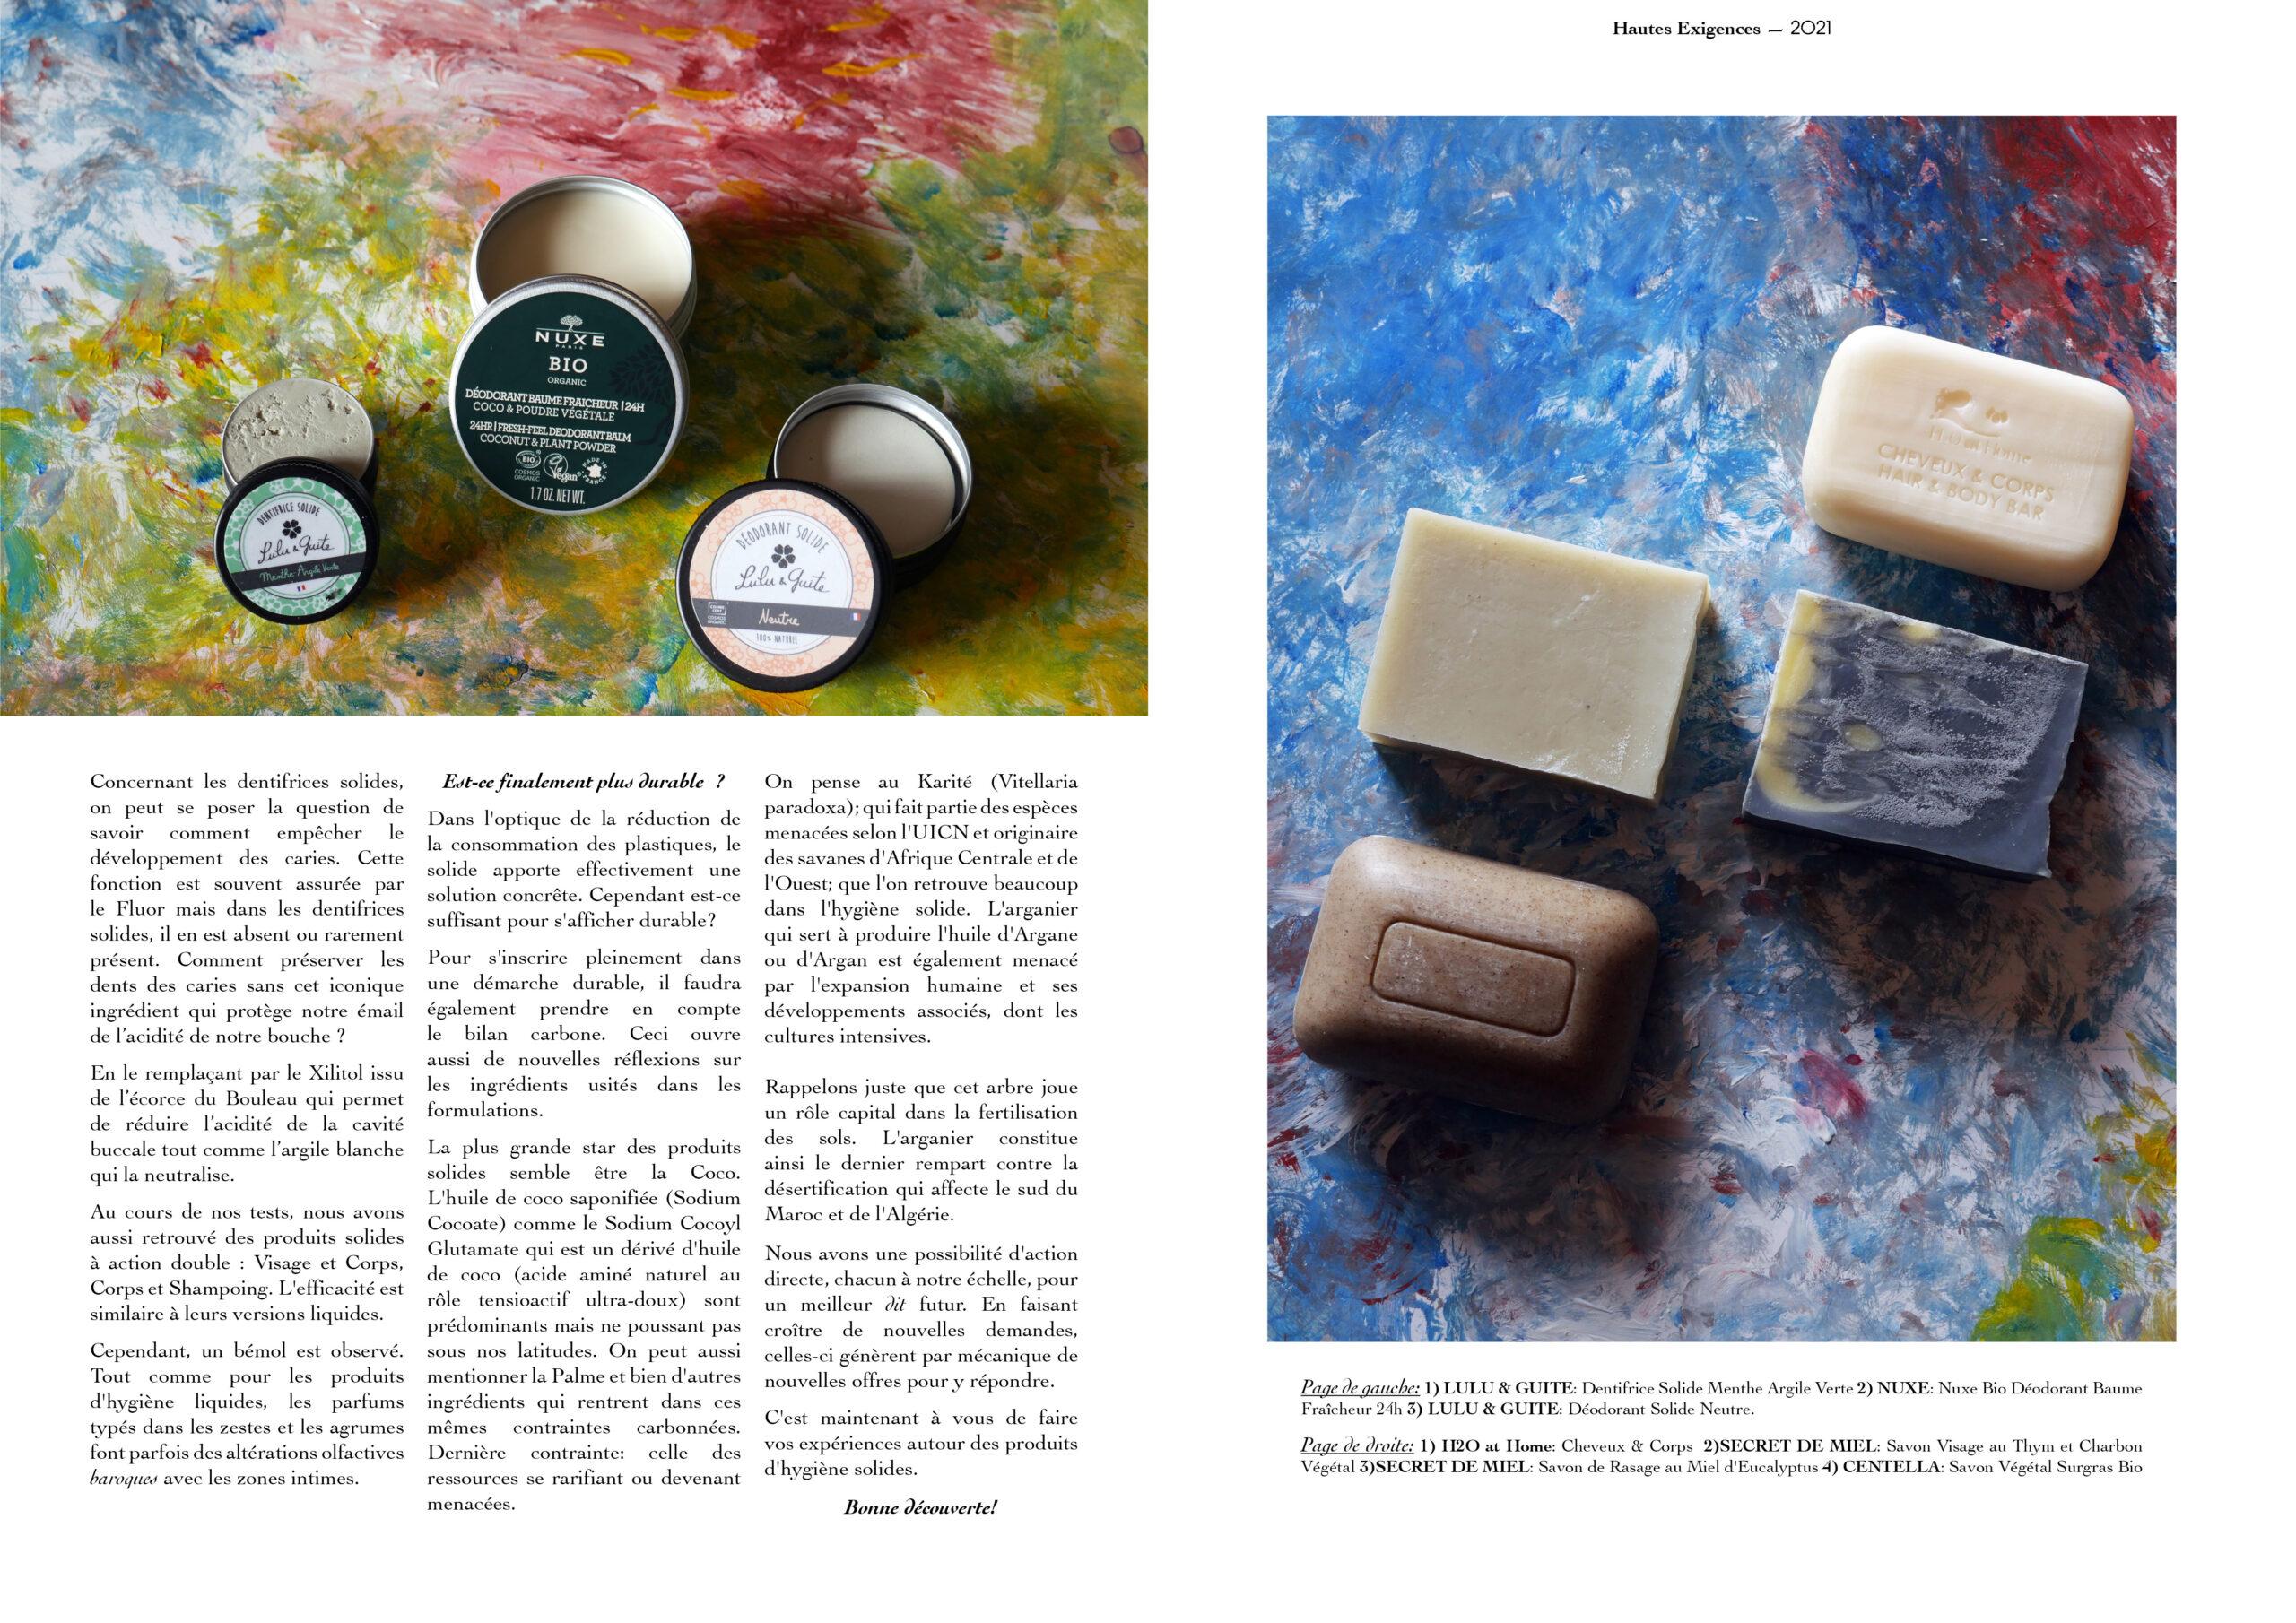 Hautes Exigences Magazine Hors Serie 2021 page 24-25